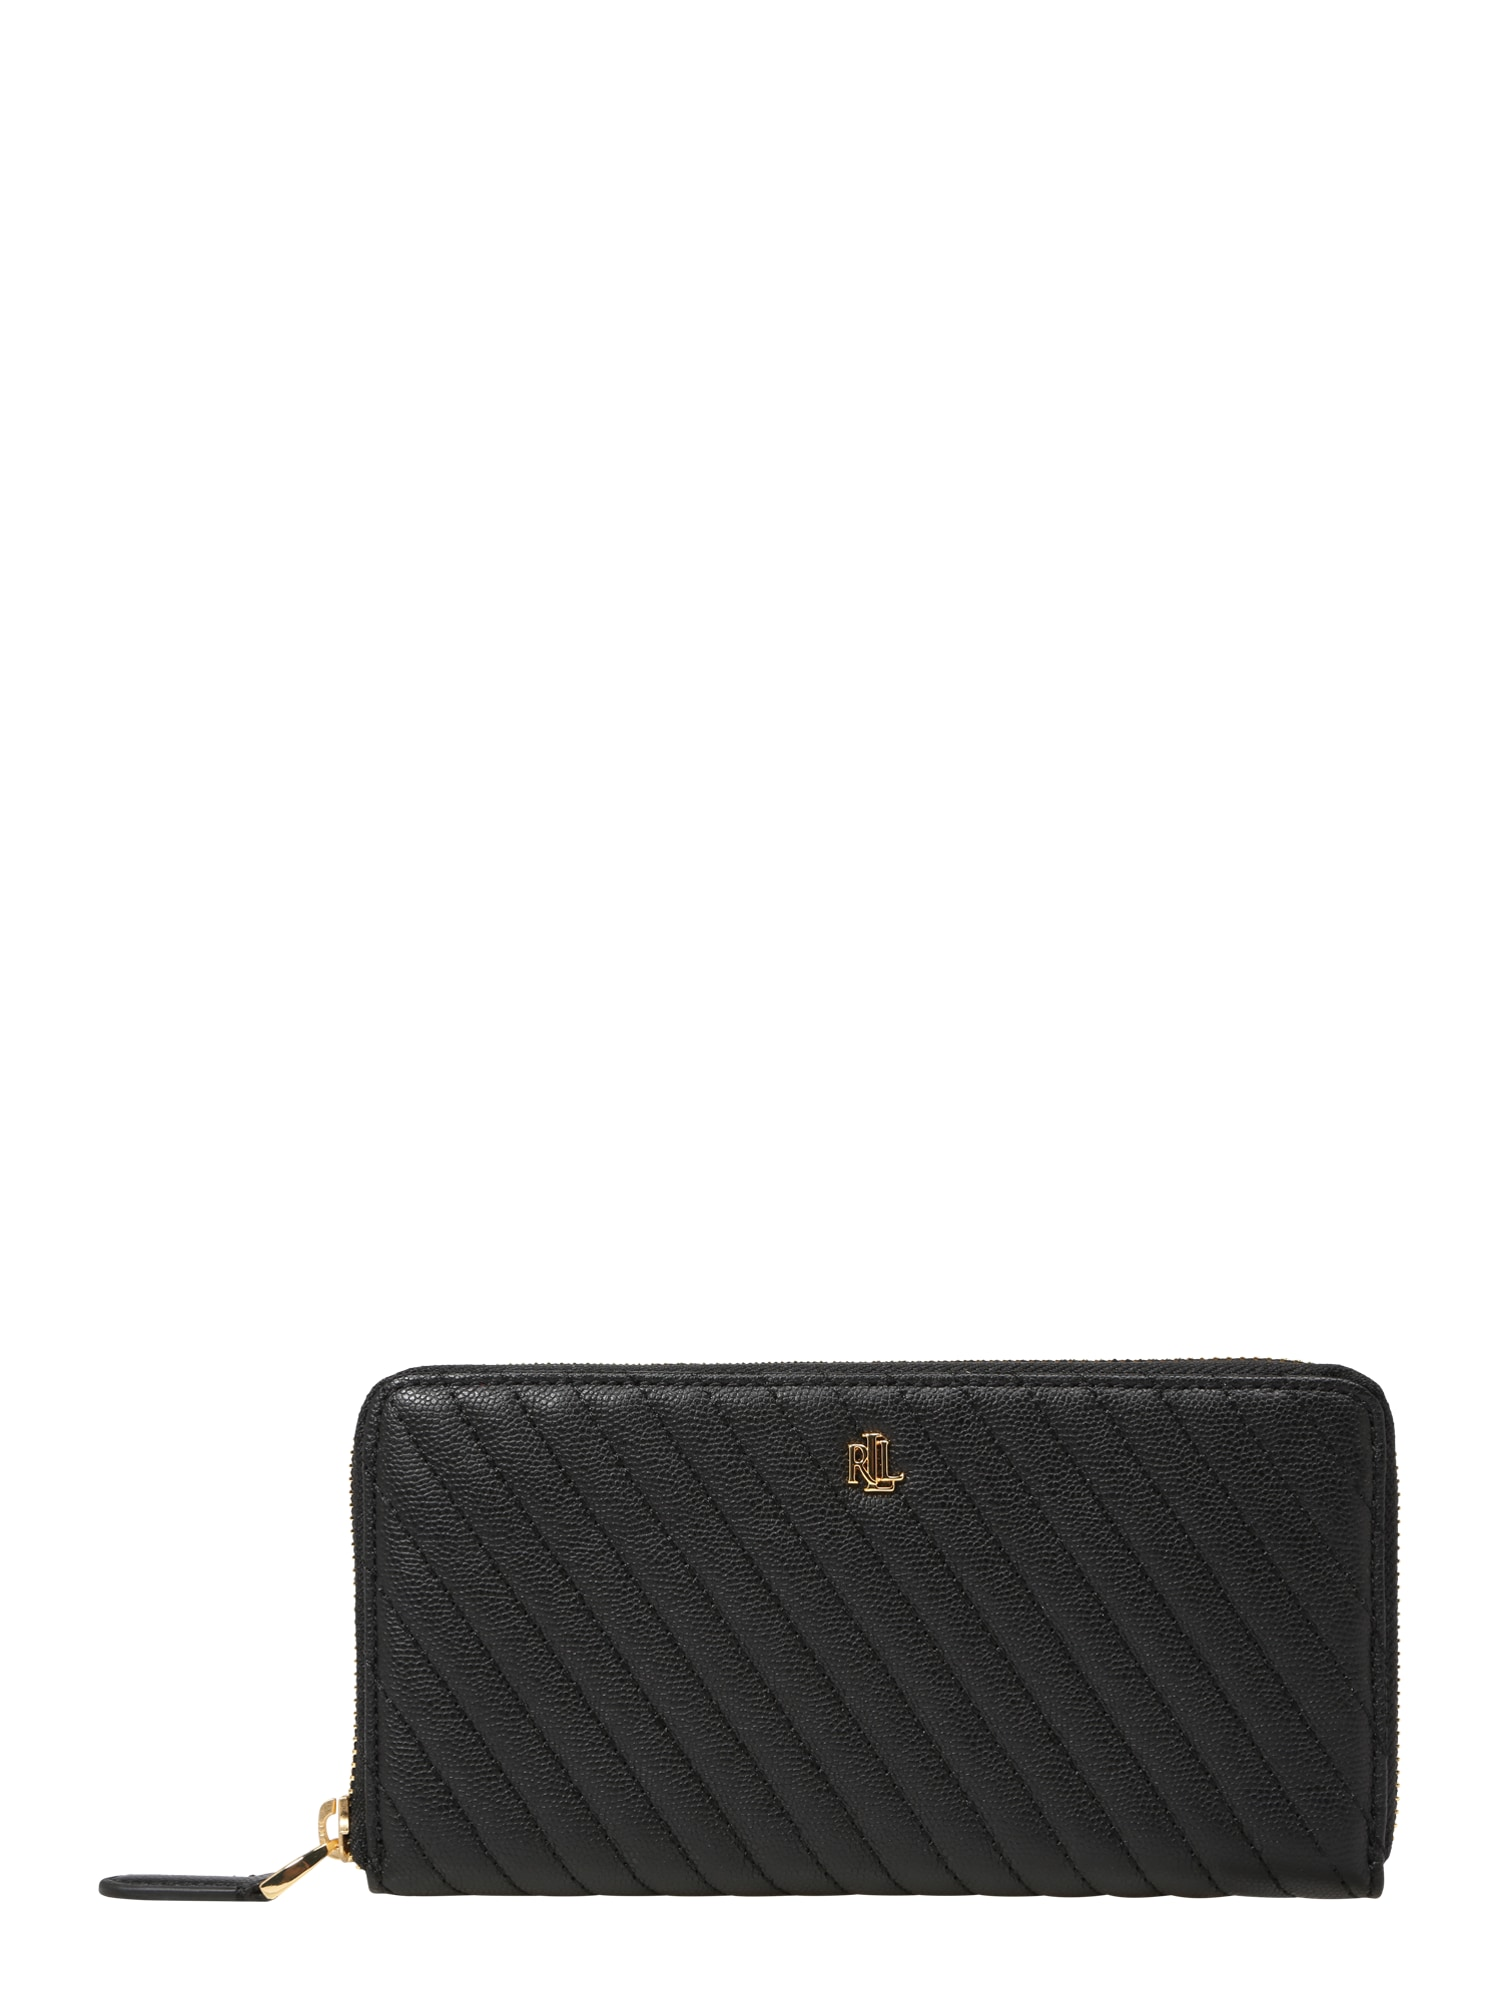 Portemonnaie | Accessoires > Portemonnaies | Schwarz | Lauren Ralph Lauren